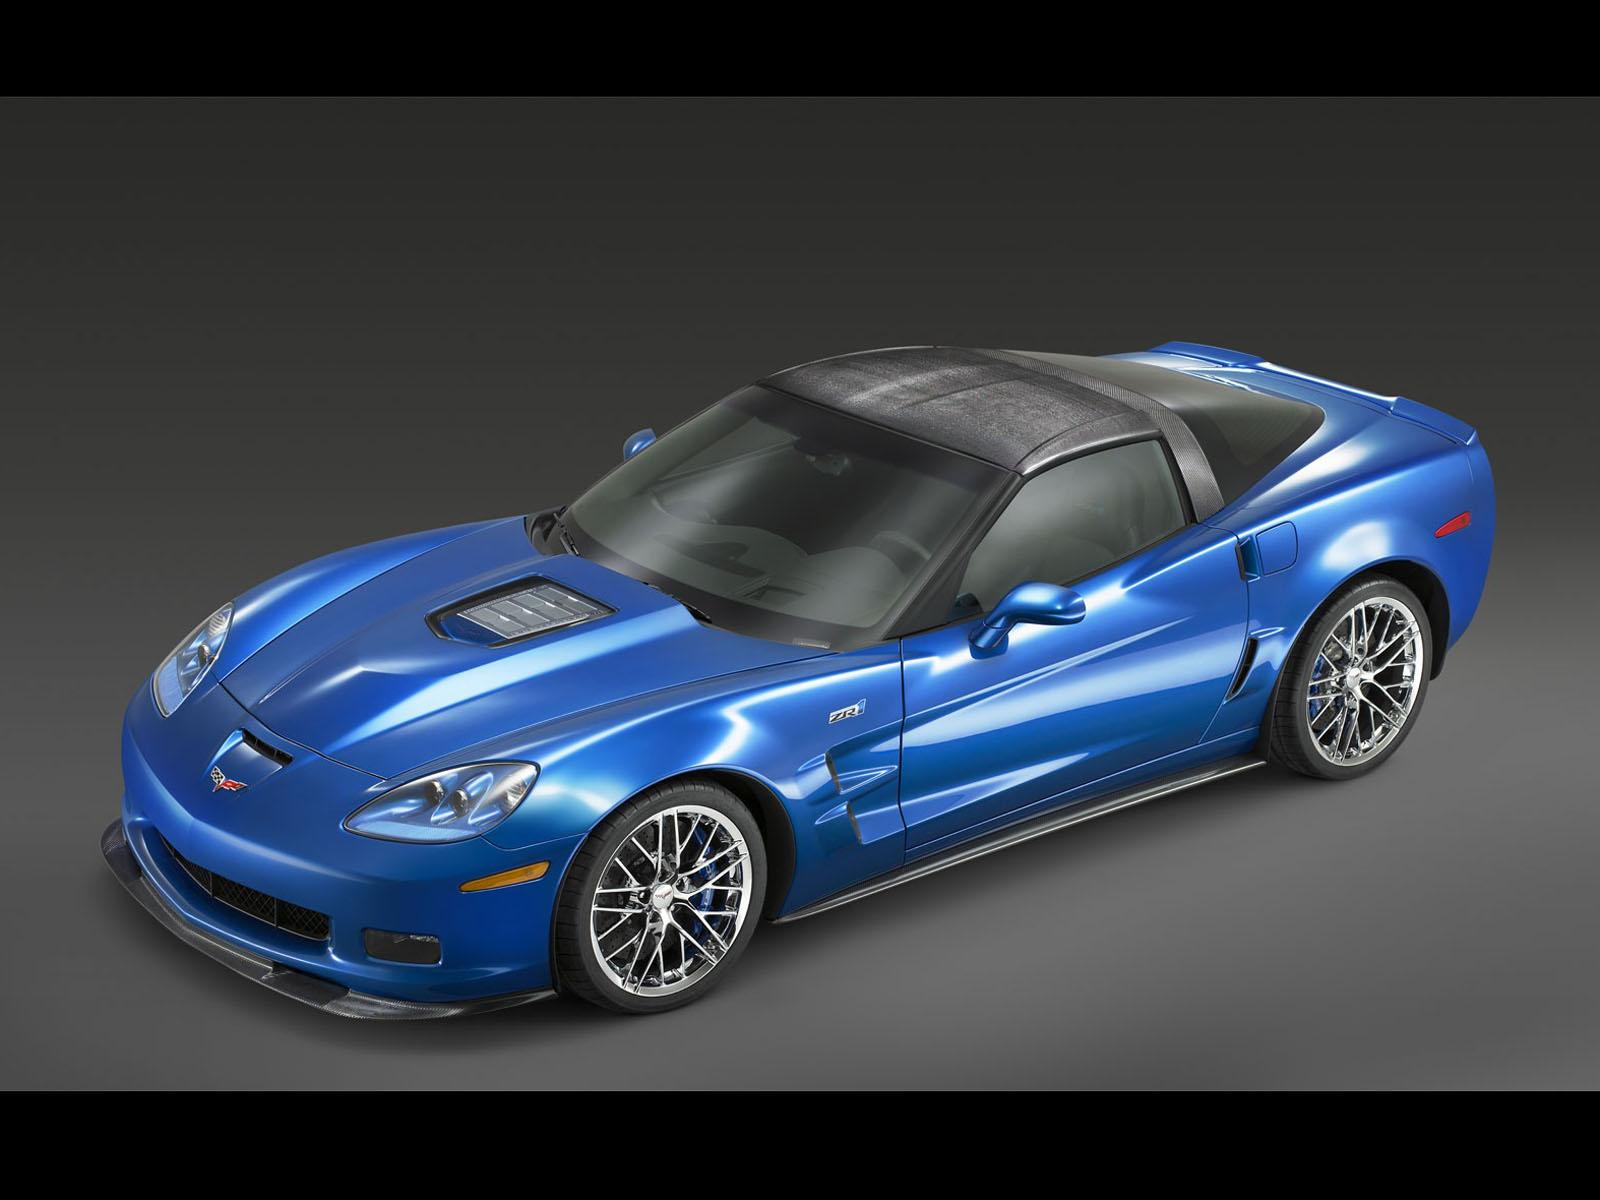 http://1.bp.blogspot.com/-R6bb67cueig/T0nee5pJrpI/AAAAAAAAAbo/U7l5aiY9EME/s1600/Chevy+Corvette+ZR1+Cars+Wallpapers+4.jpg